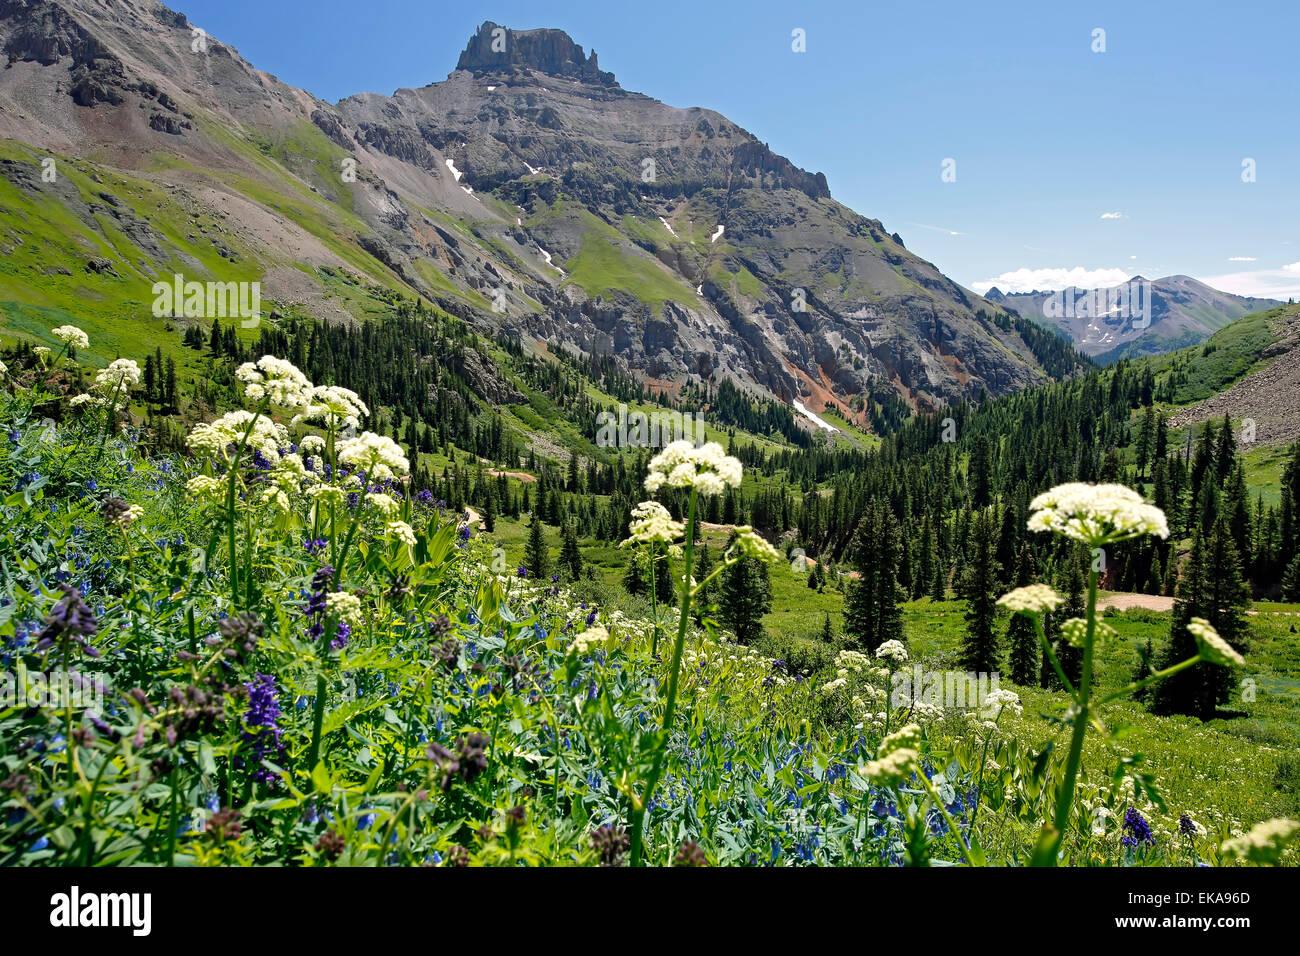 Teakettle Mountain and wildflowers, Yankee Boy Basin, near Ouray, Colorado USA - Stock Image